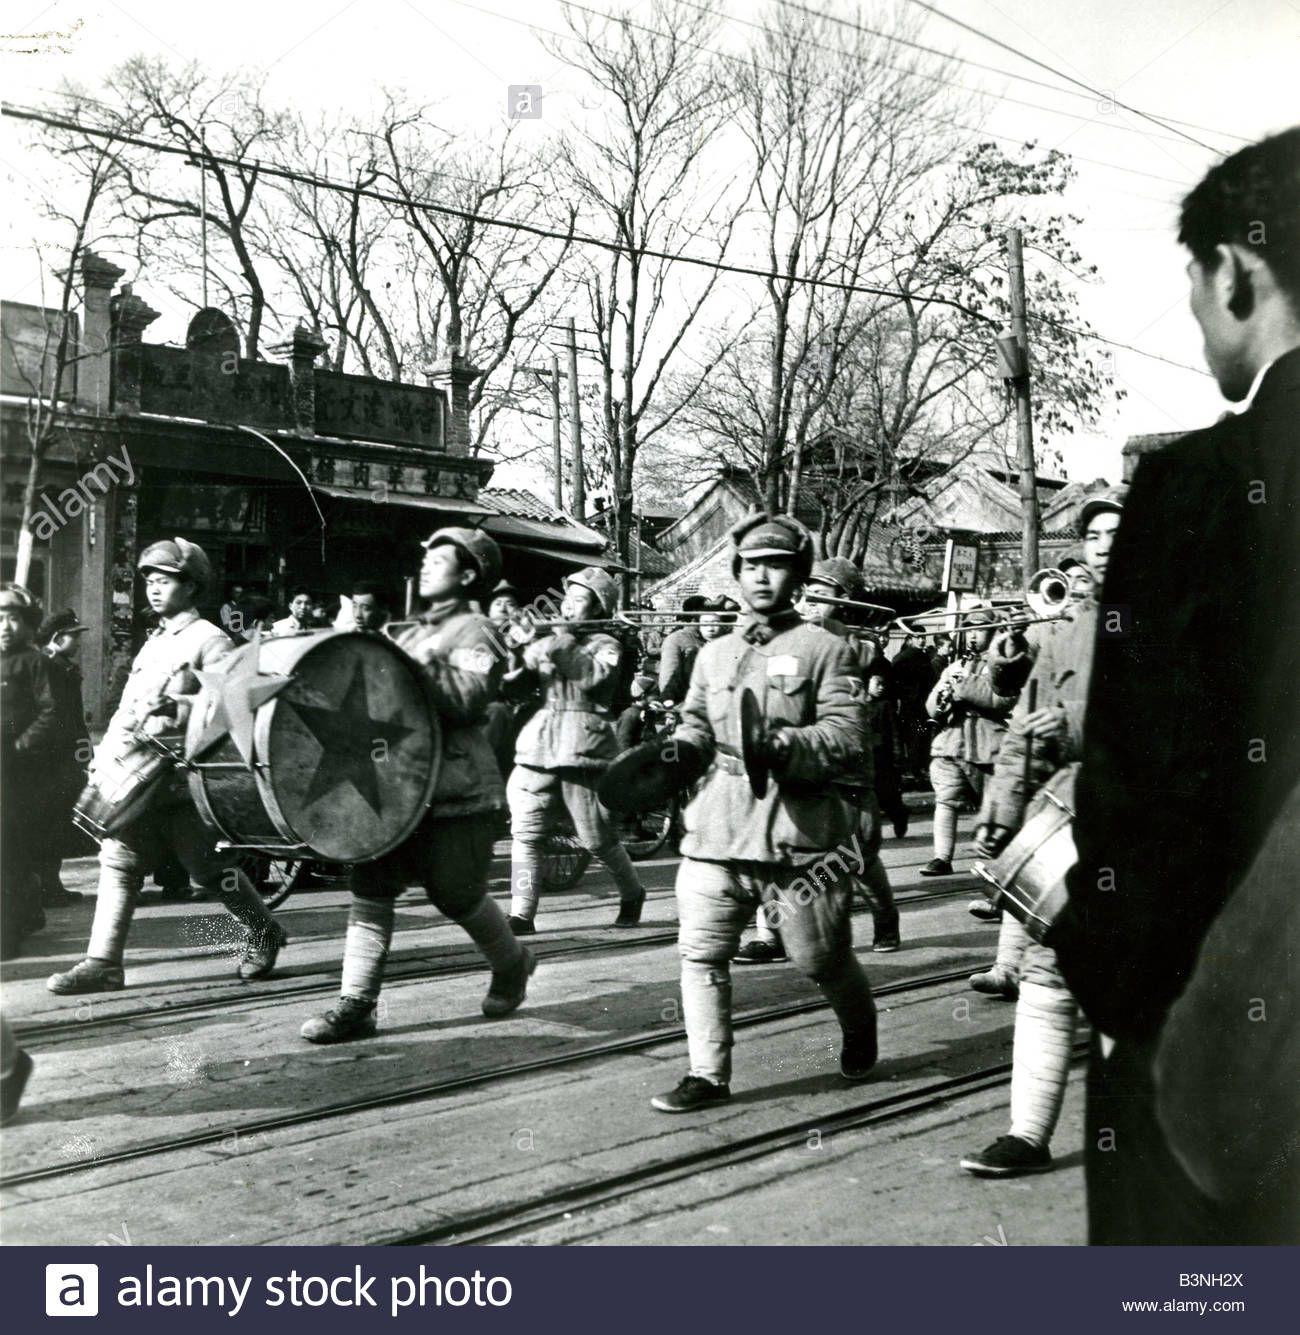 Peking Chinese Communist Troops Enter Peking Now Beijing In 1949